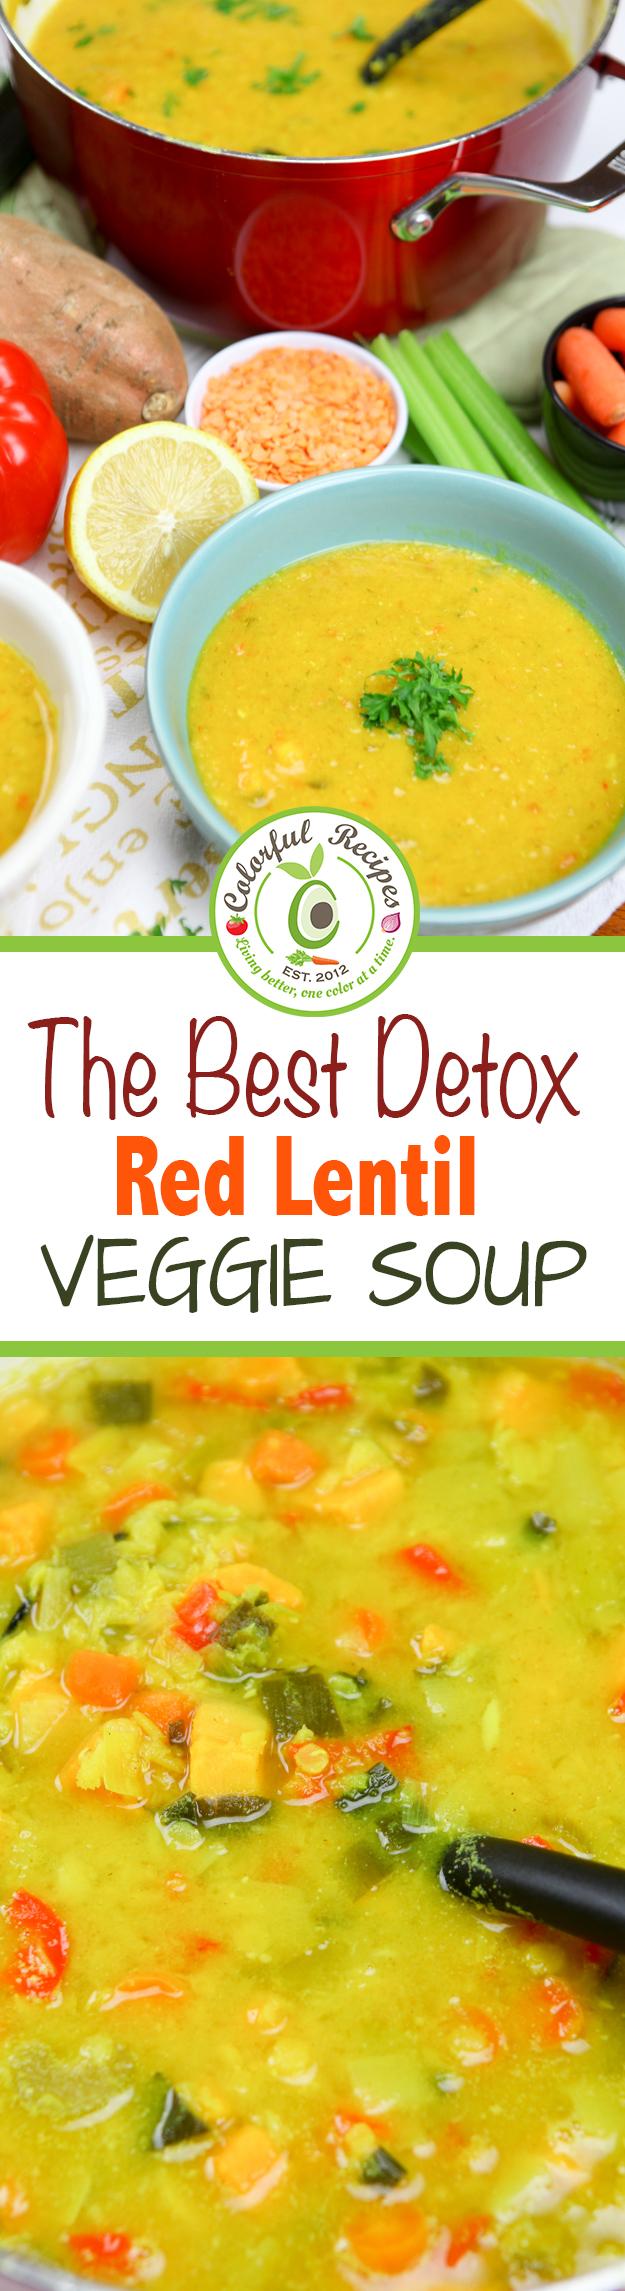 The Best Detox Red Lentil Veggie Soup